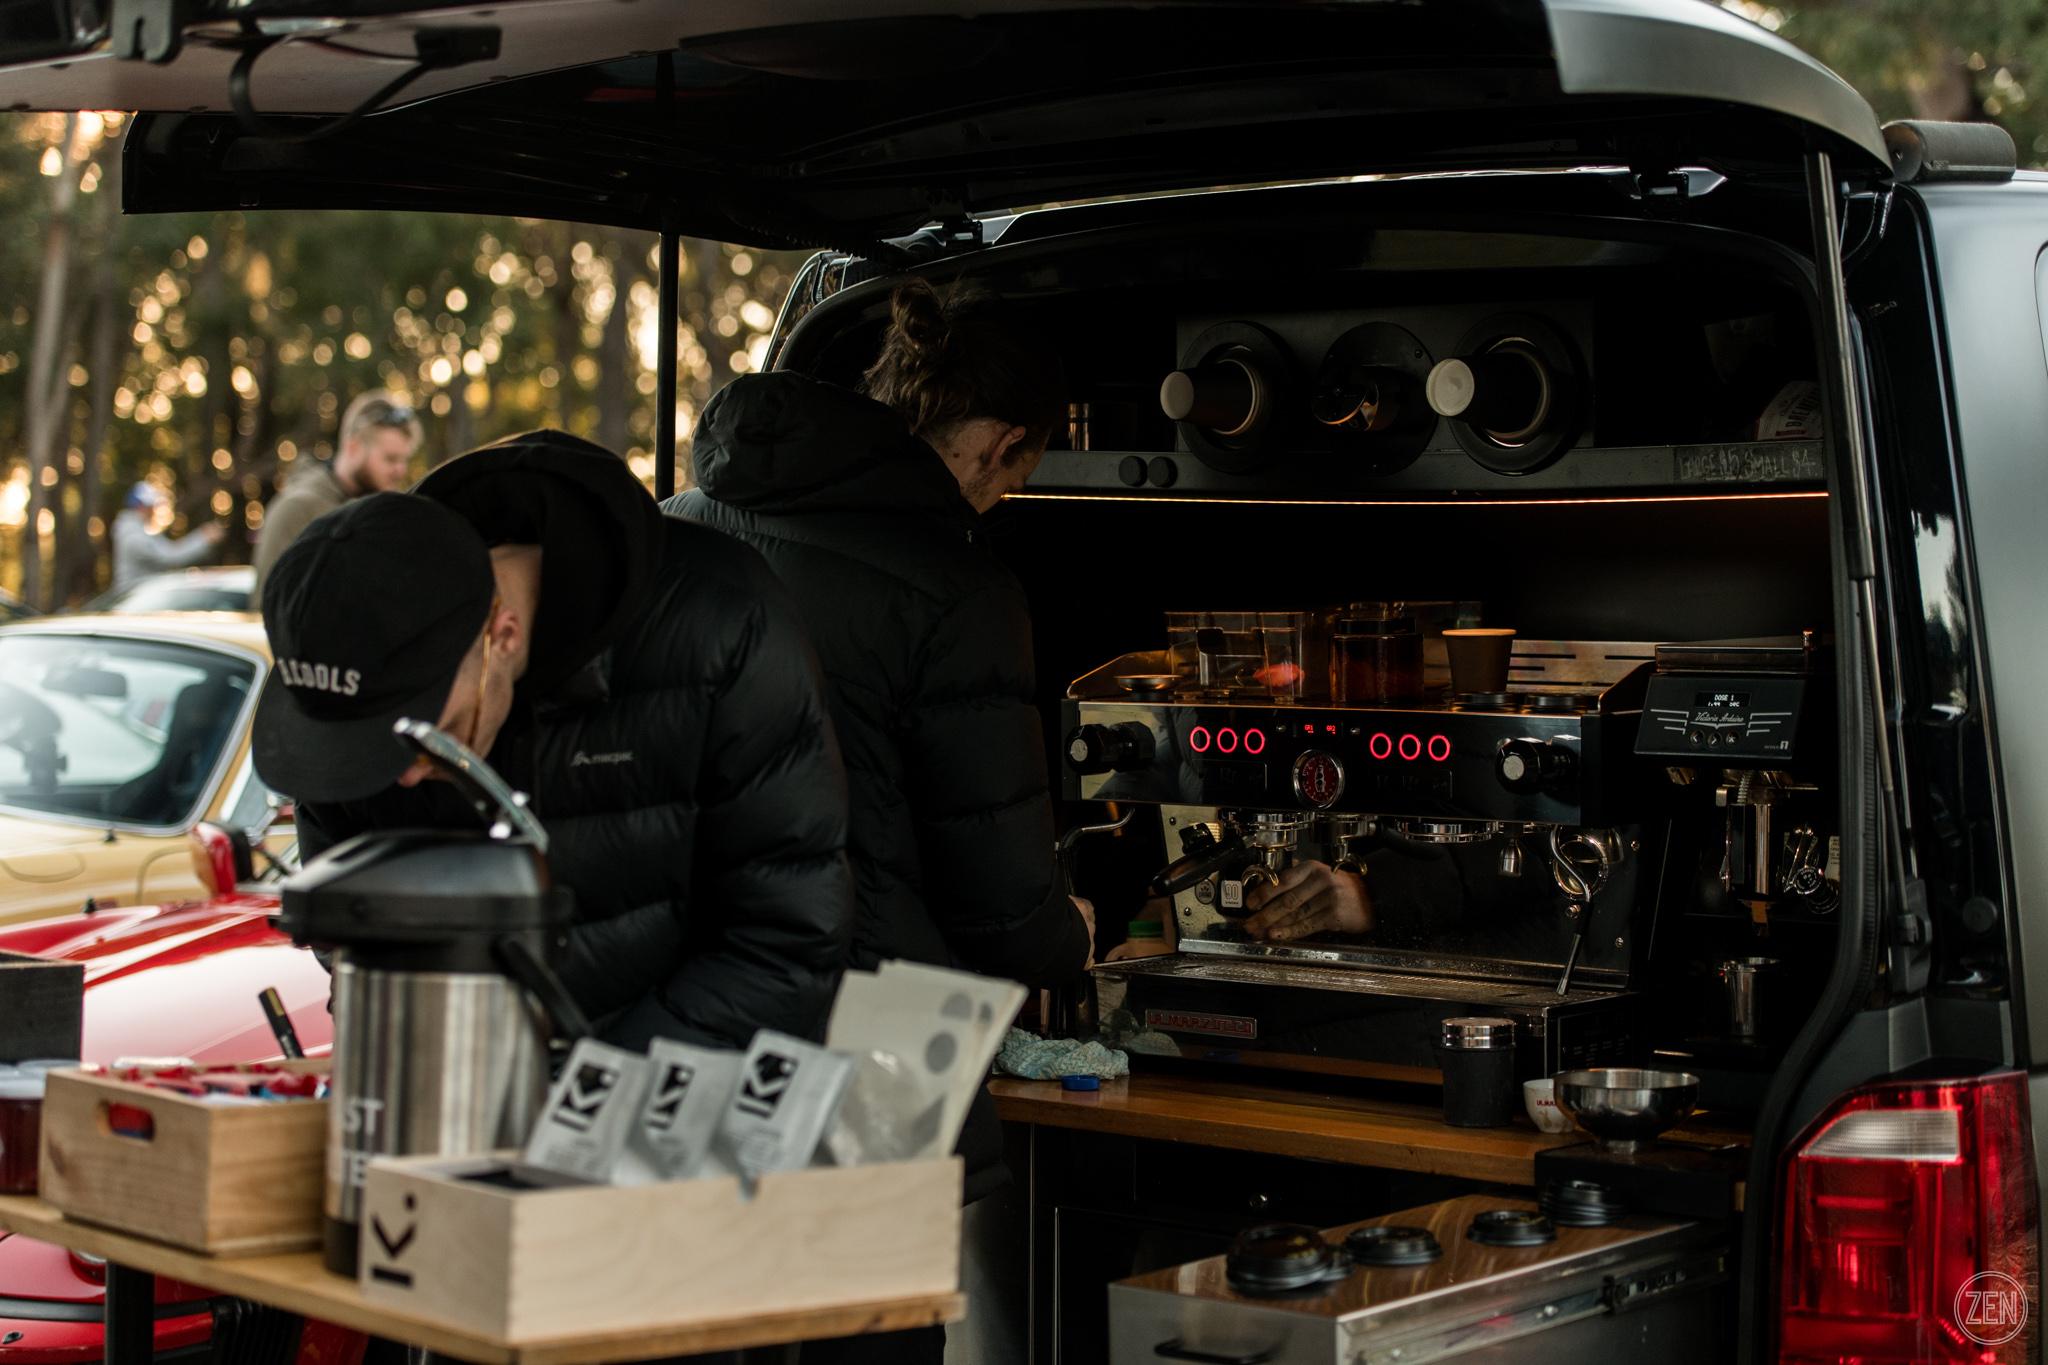 2019-07-21 - Autohaus Porches & Coffee 029